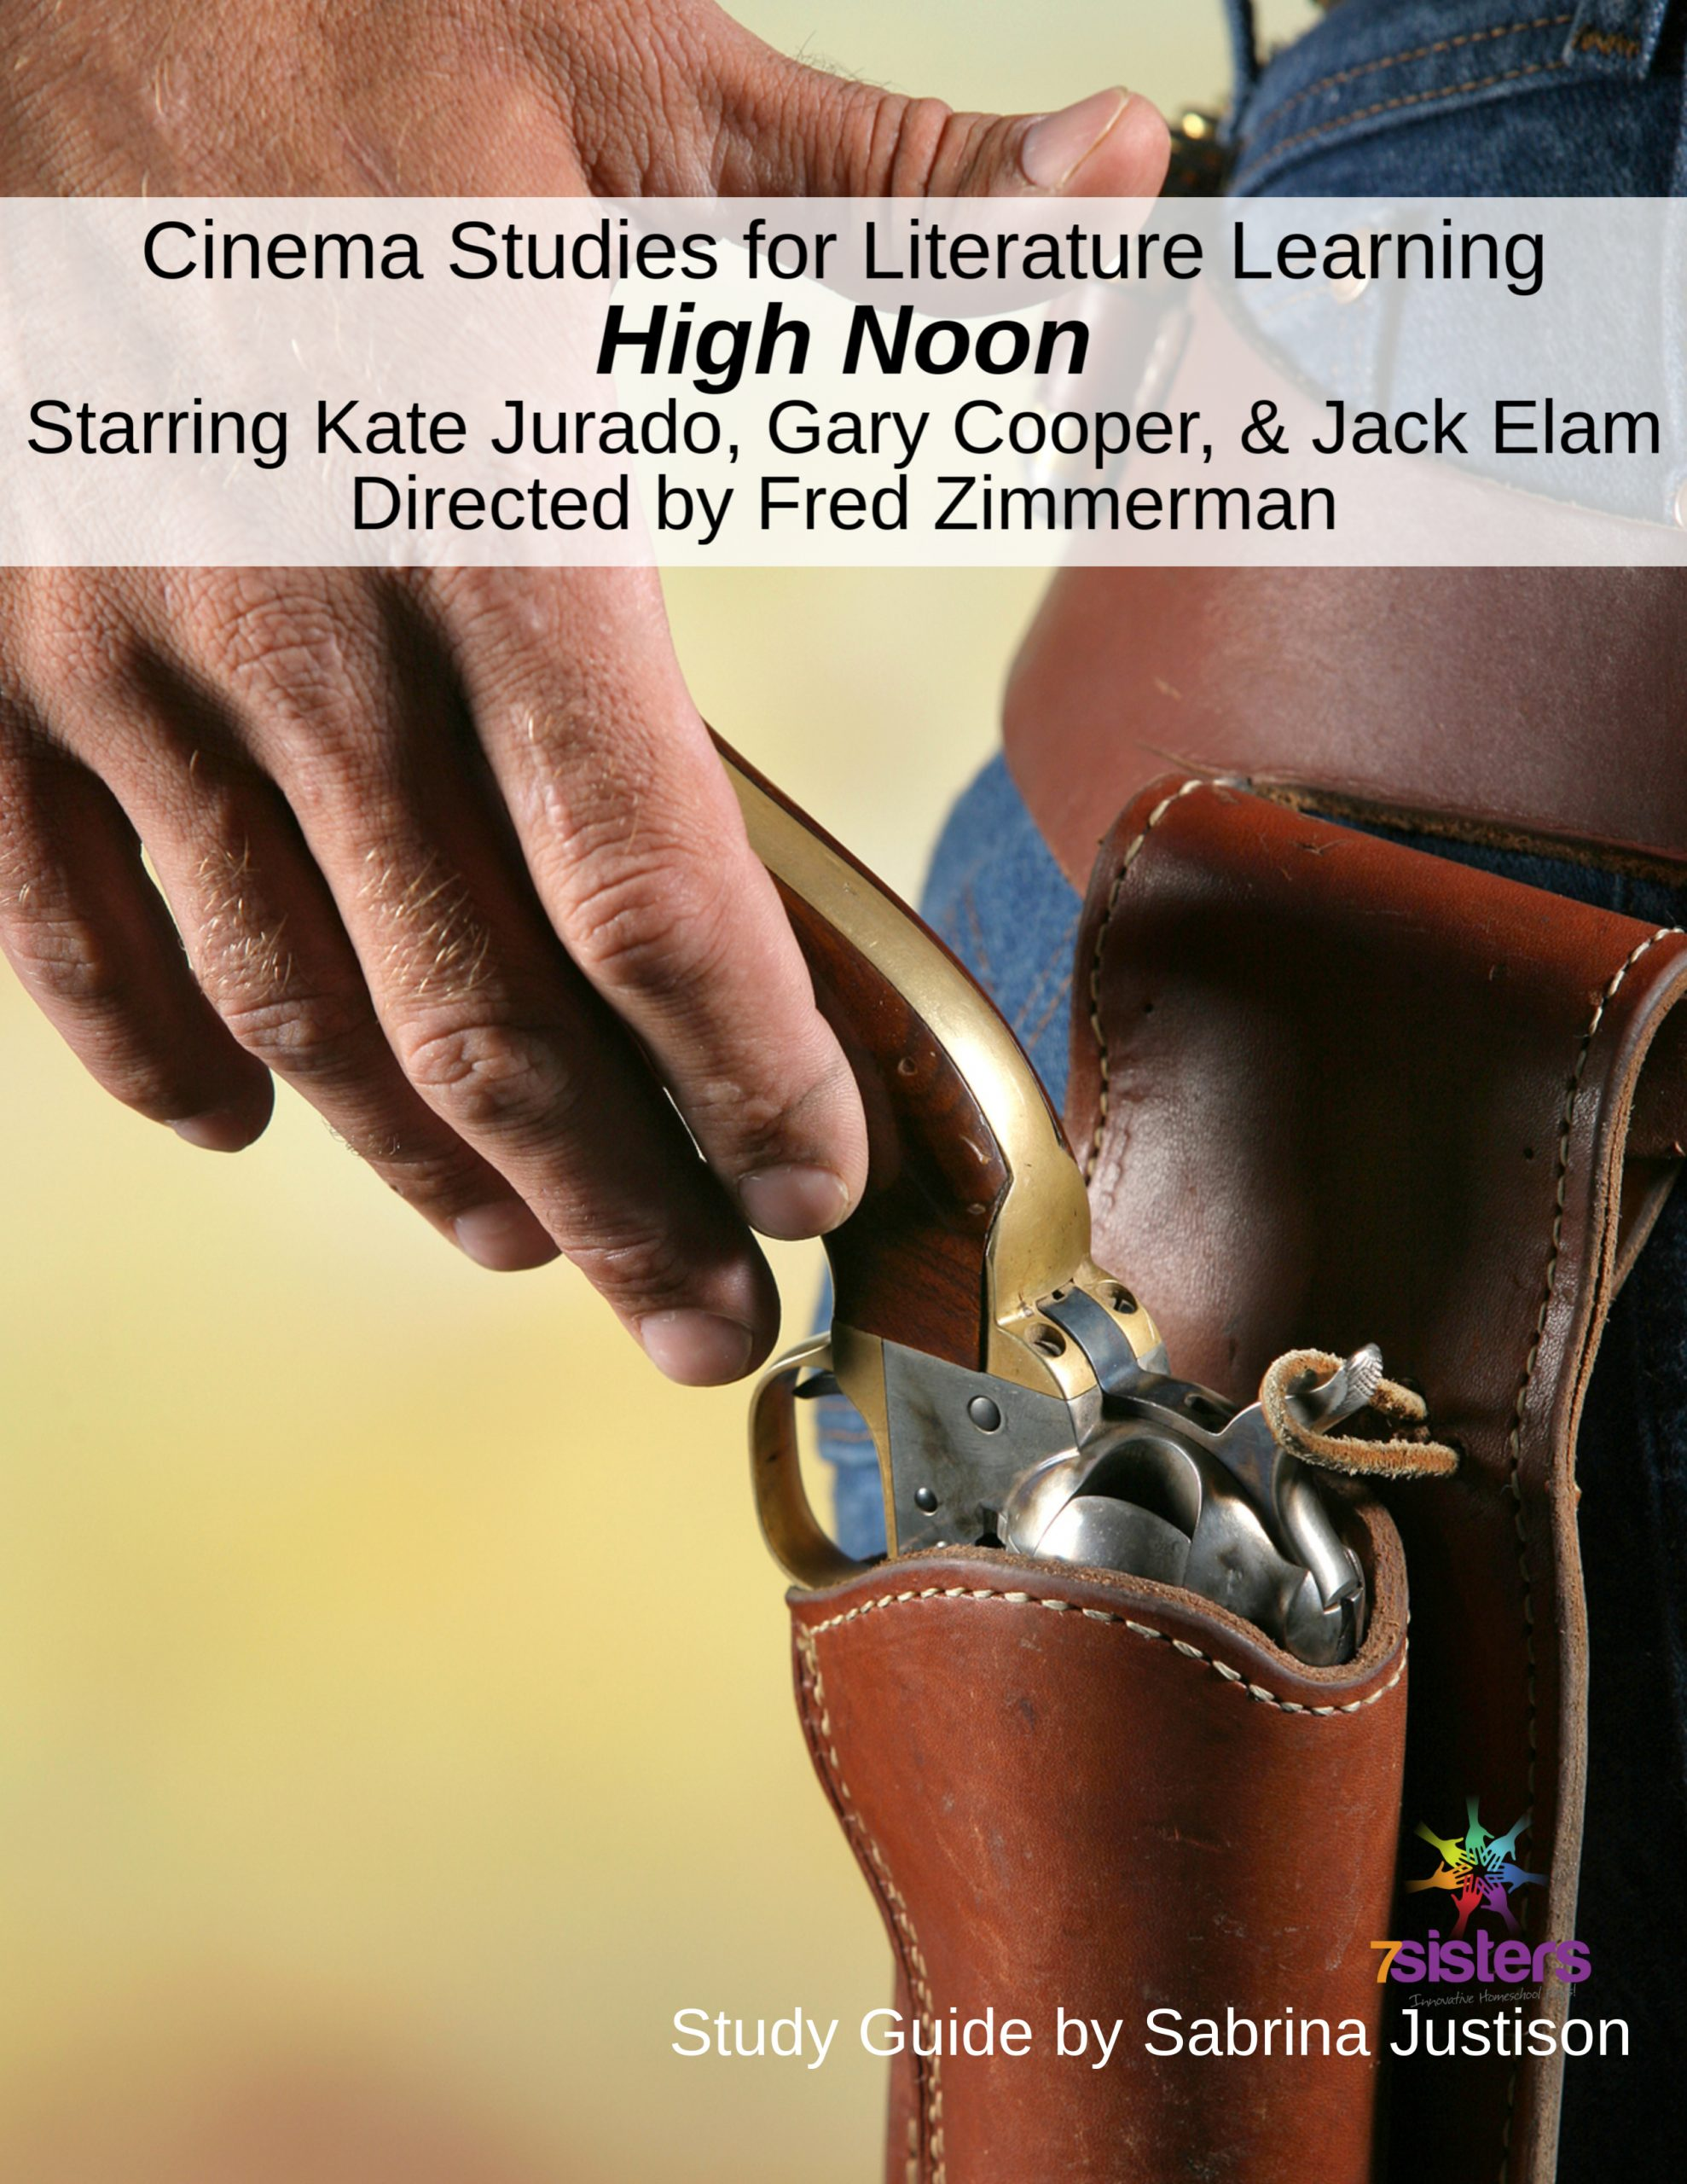 High Noon Cinema Study Guide